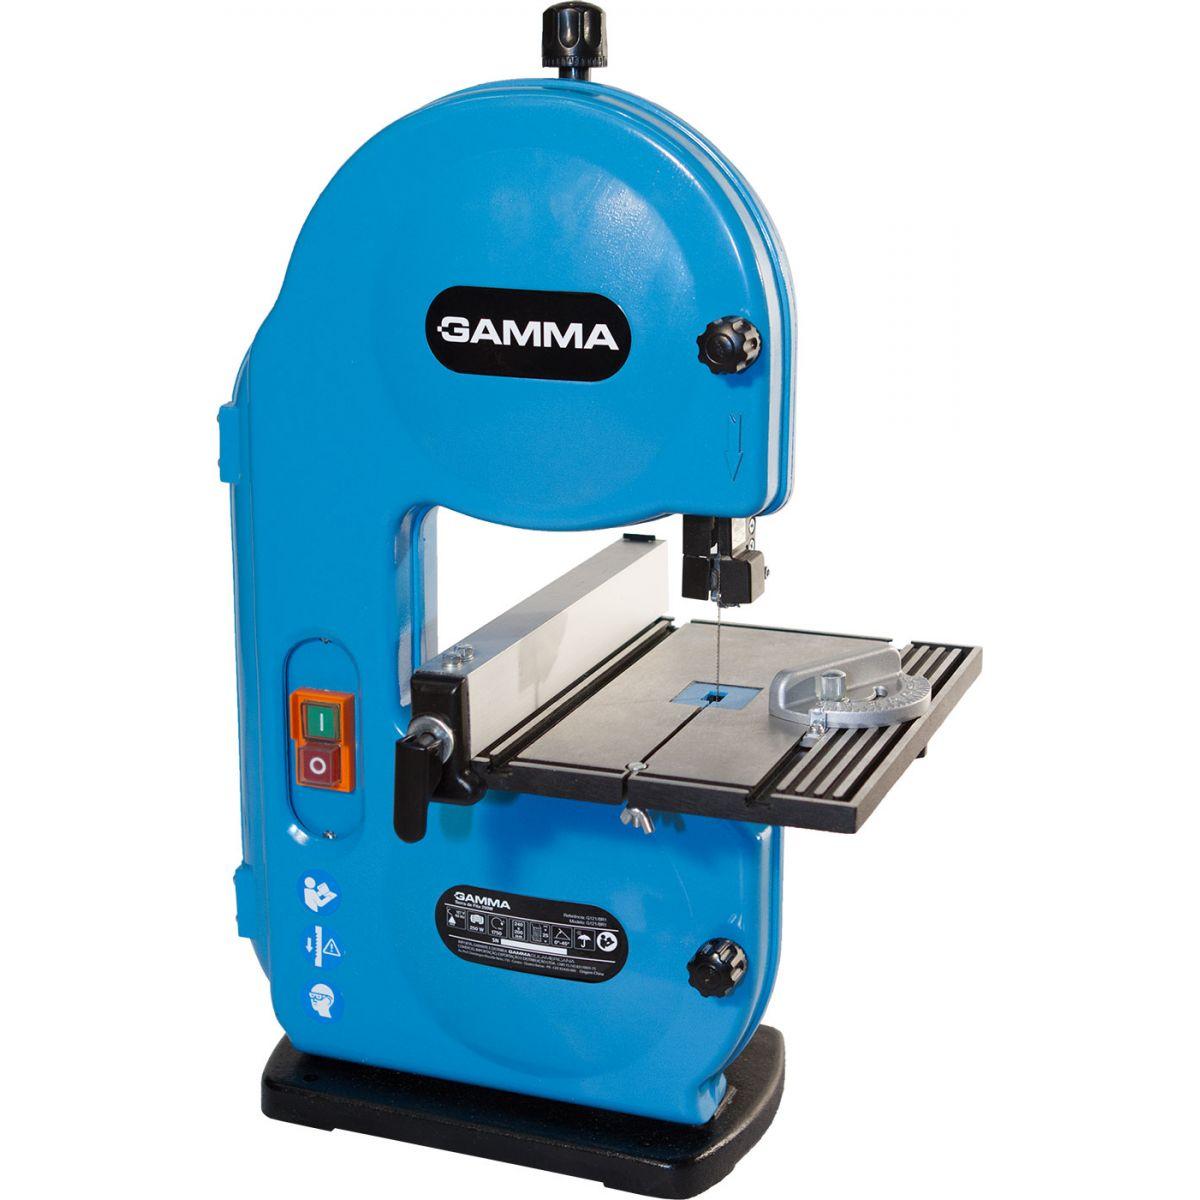 Serra Fita Bancada Gamma G121